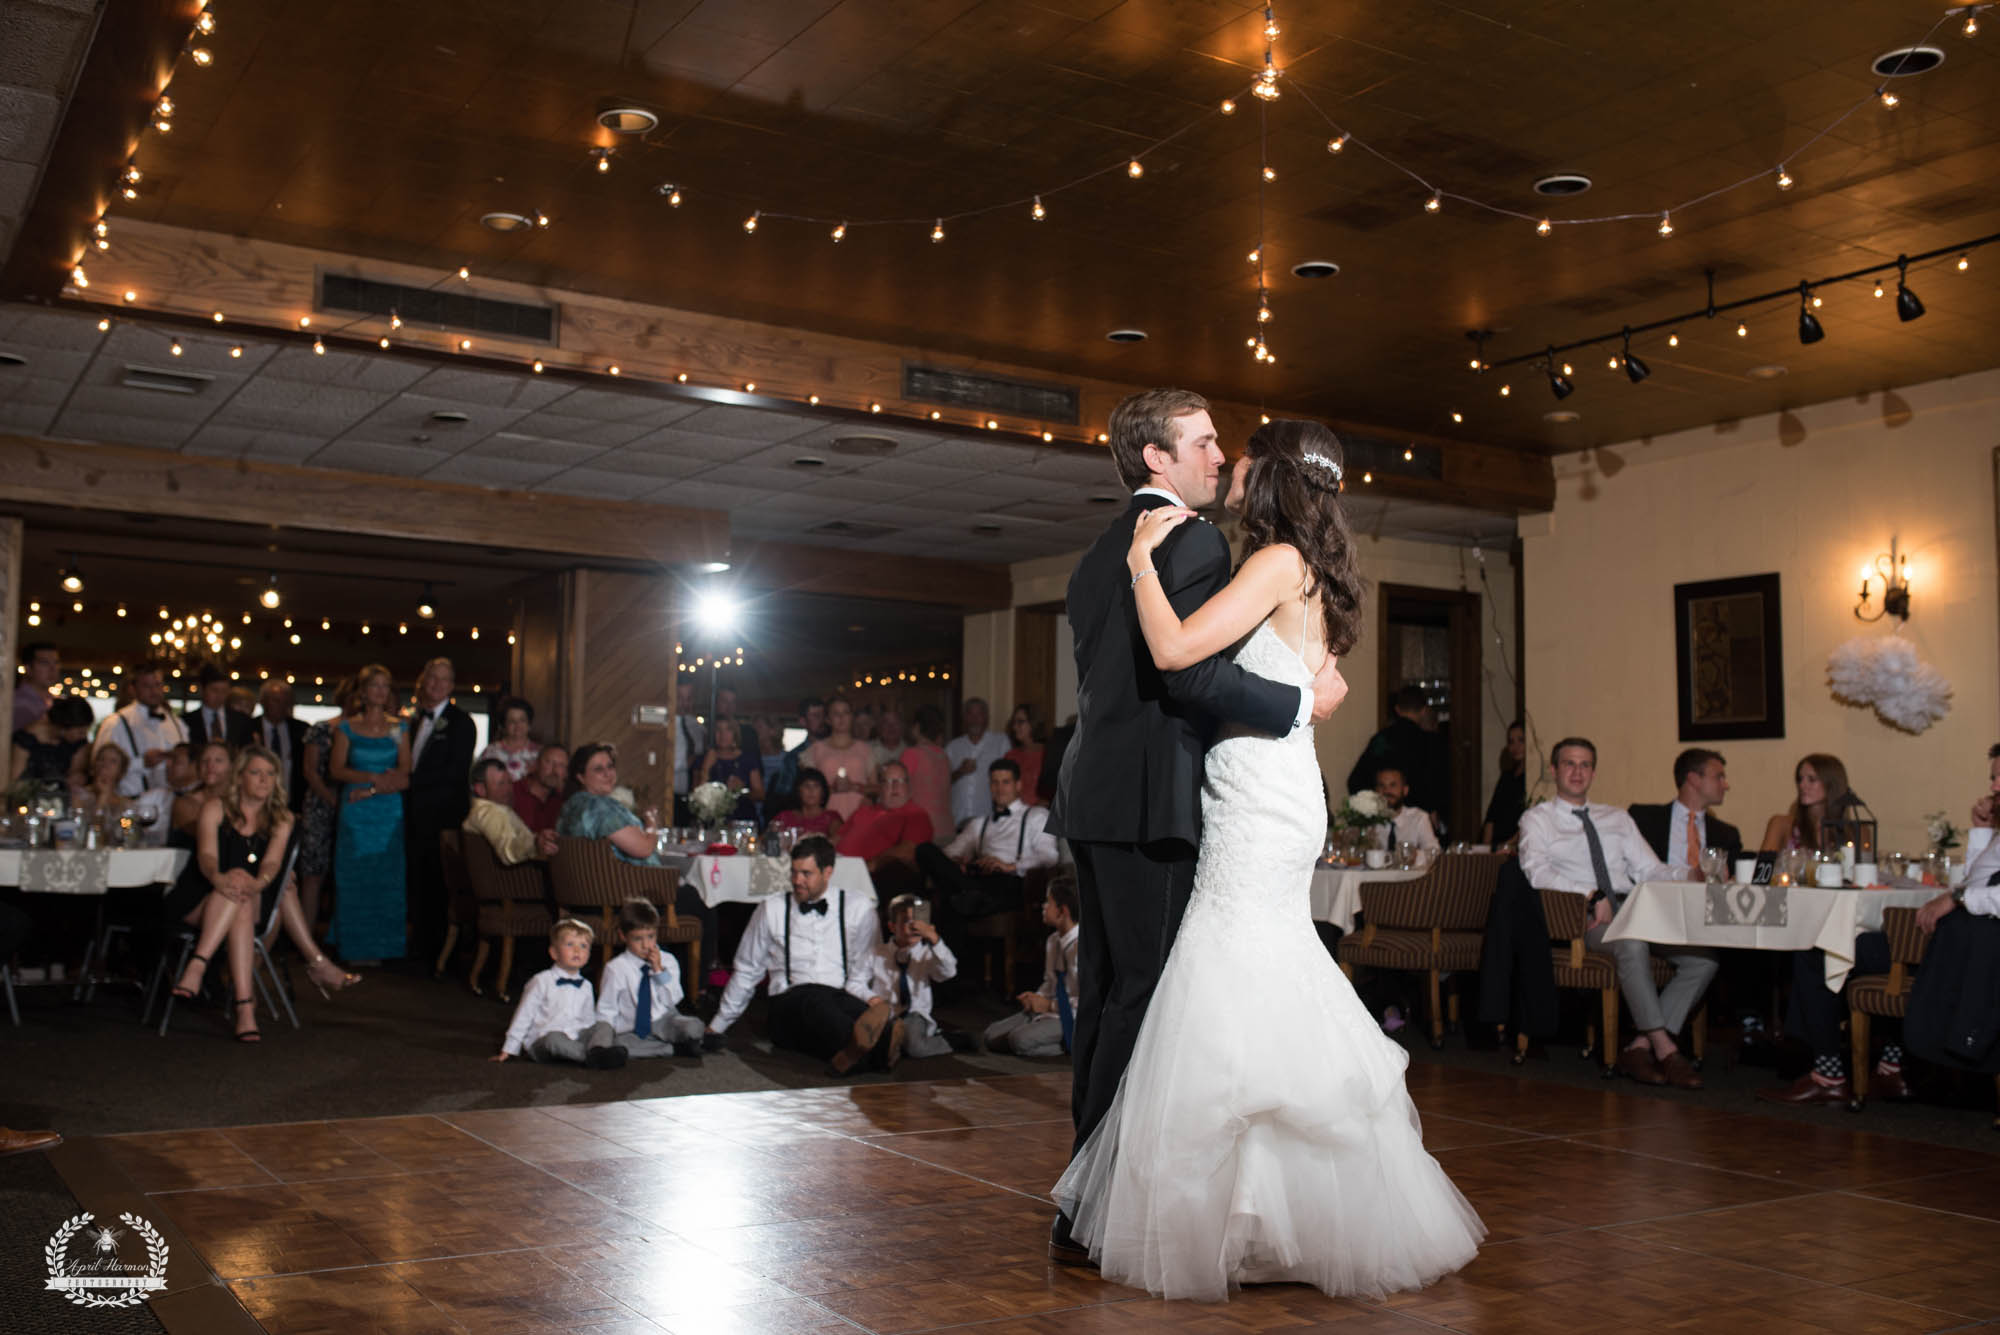 kansas-wedding-photographer46.jpg